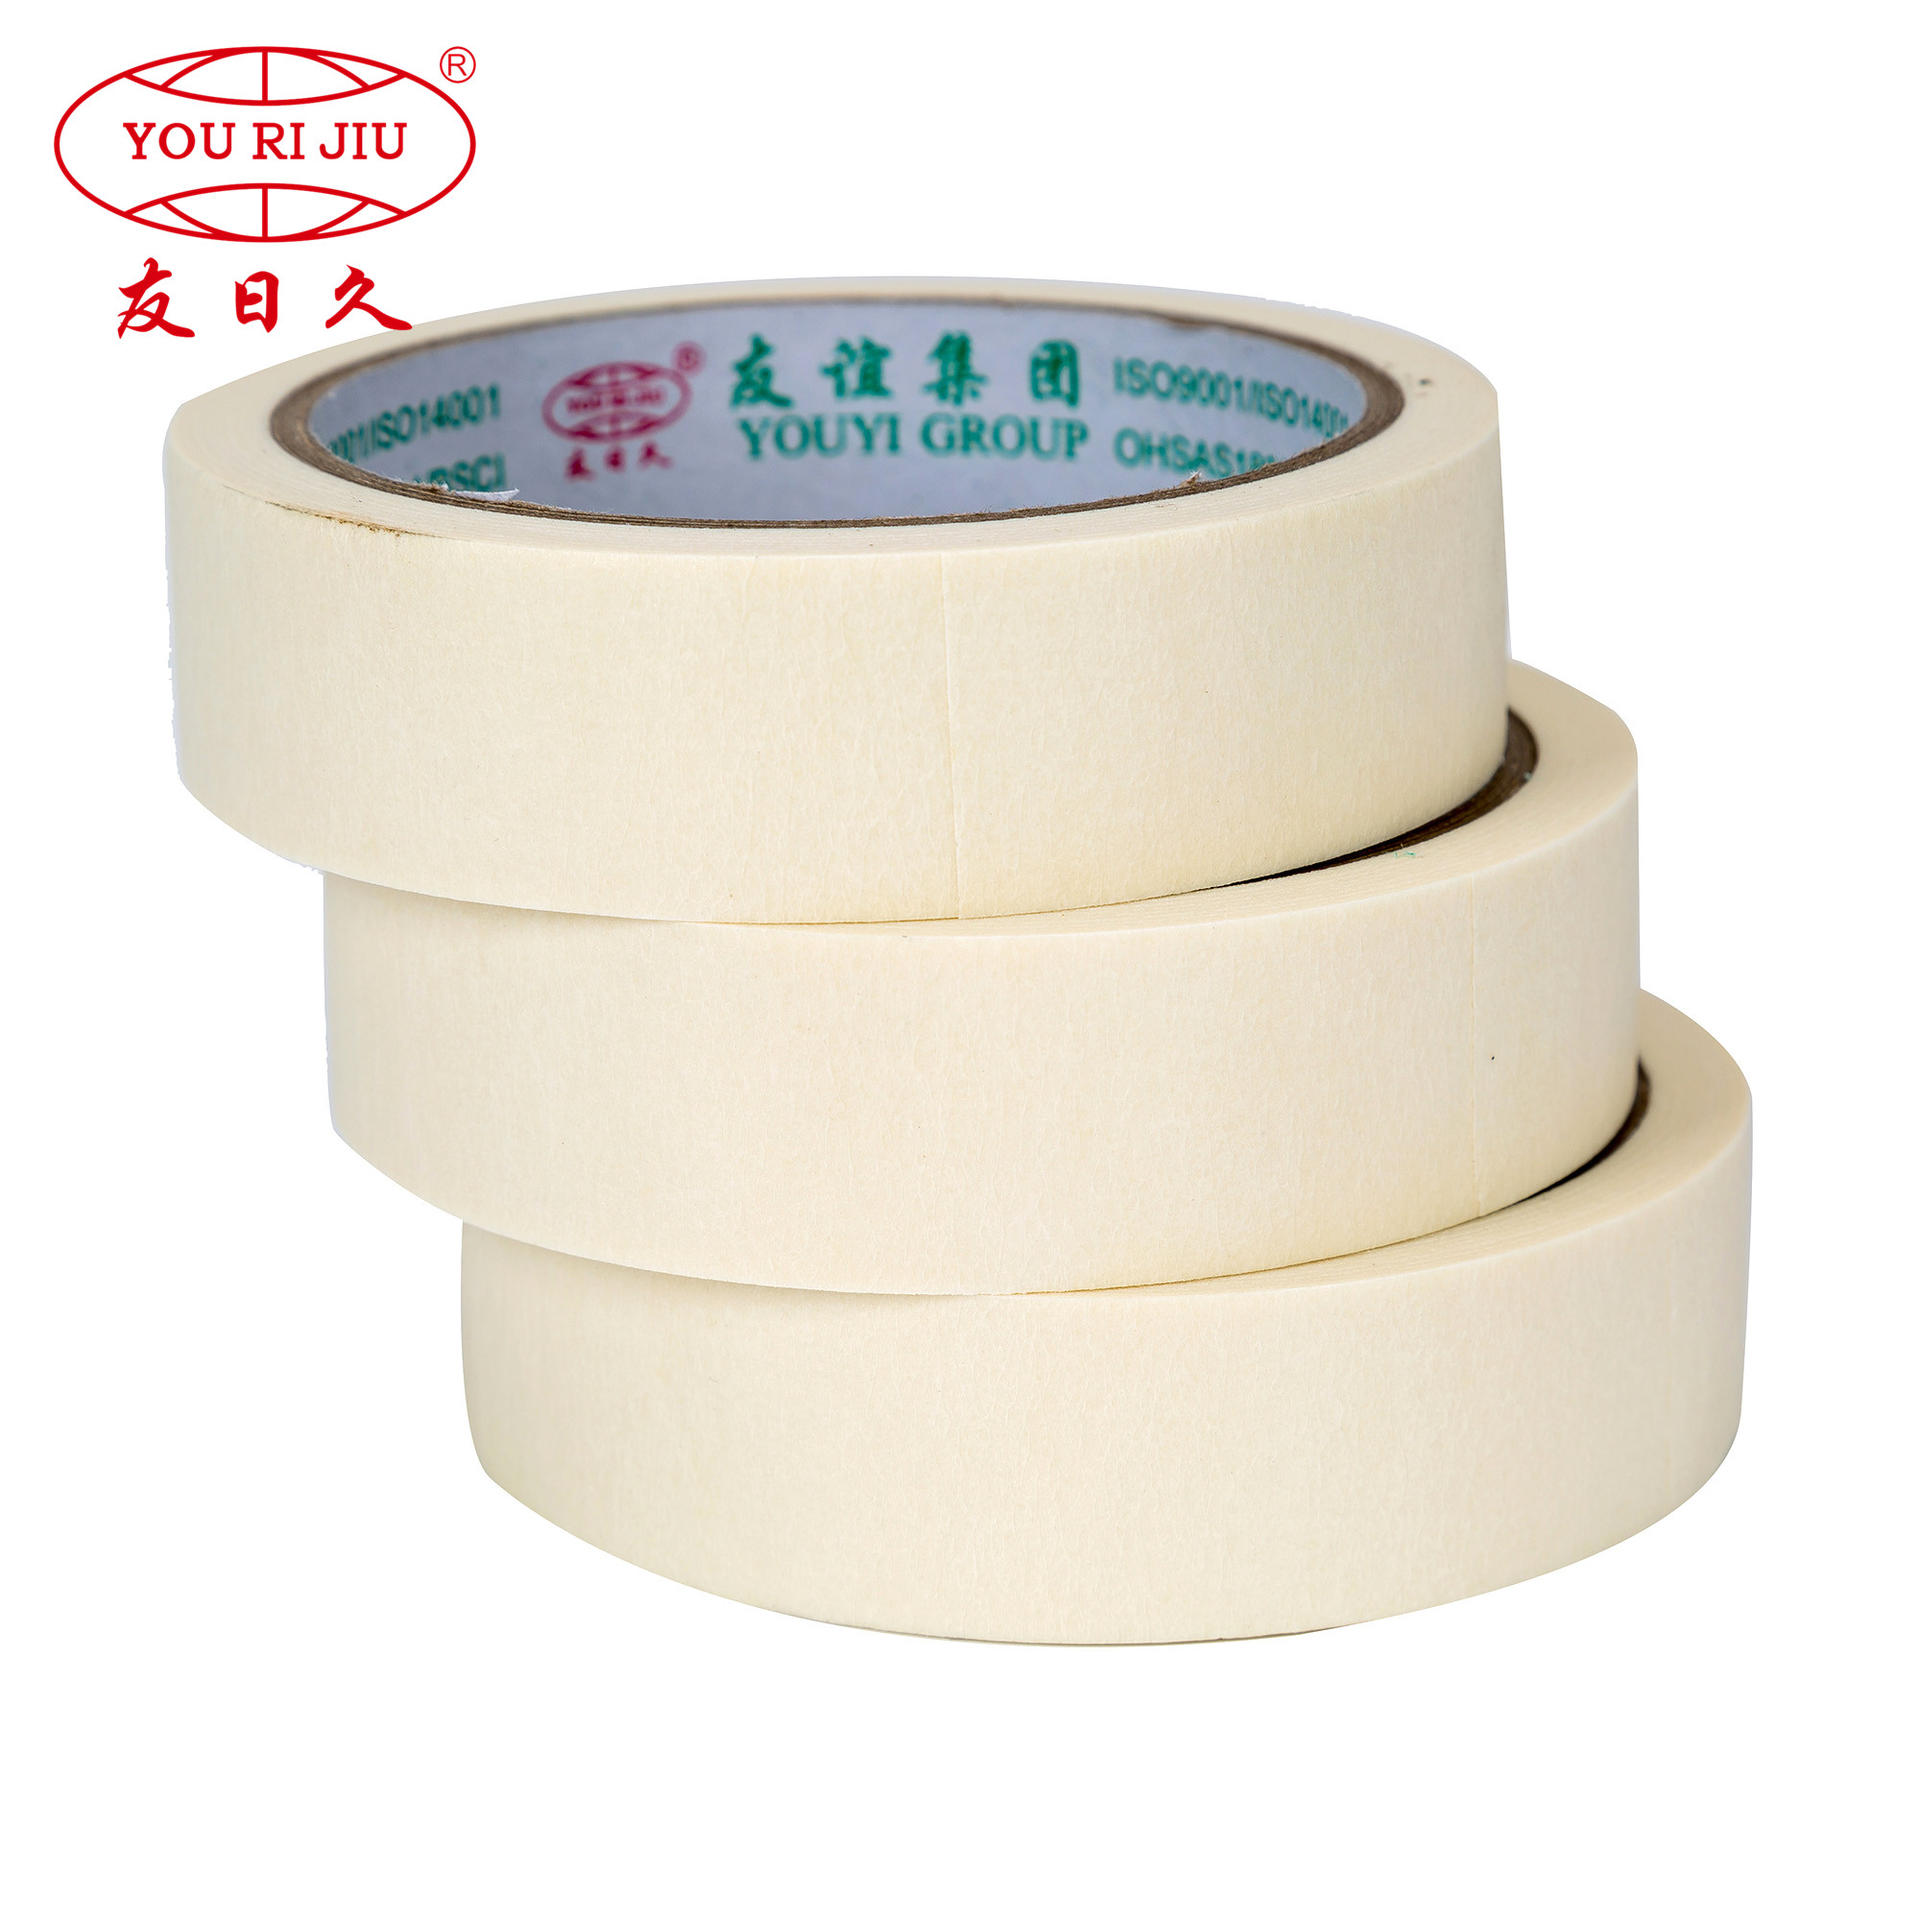 1270mm x 2000m economic masking tape jumbo roll